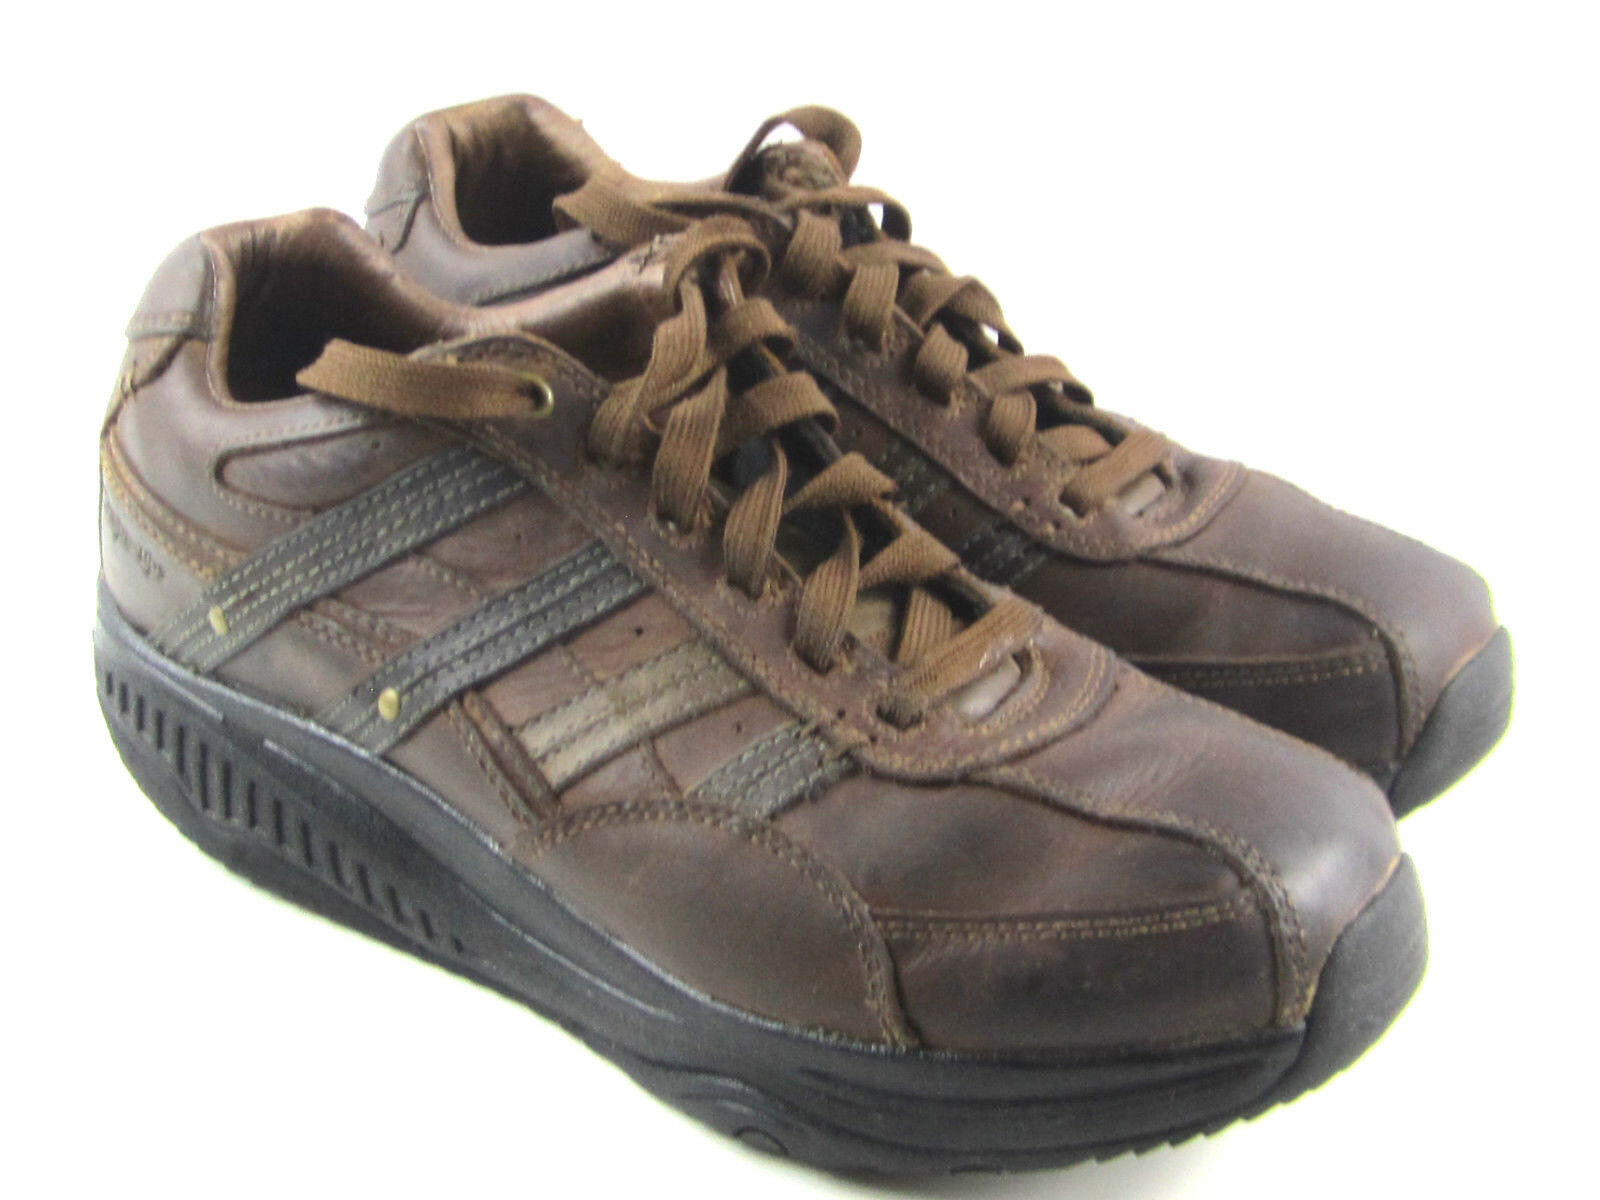 Skechers Shape Ups XT Mover Marrón con Cordones Tonificación Caminar Zapatos